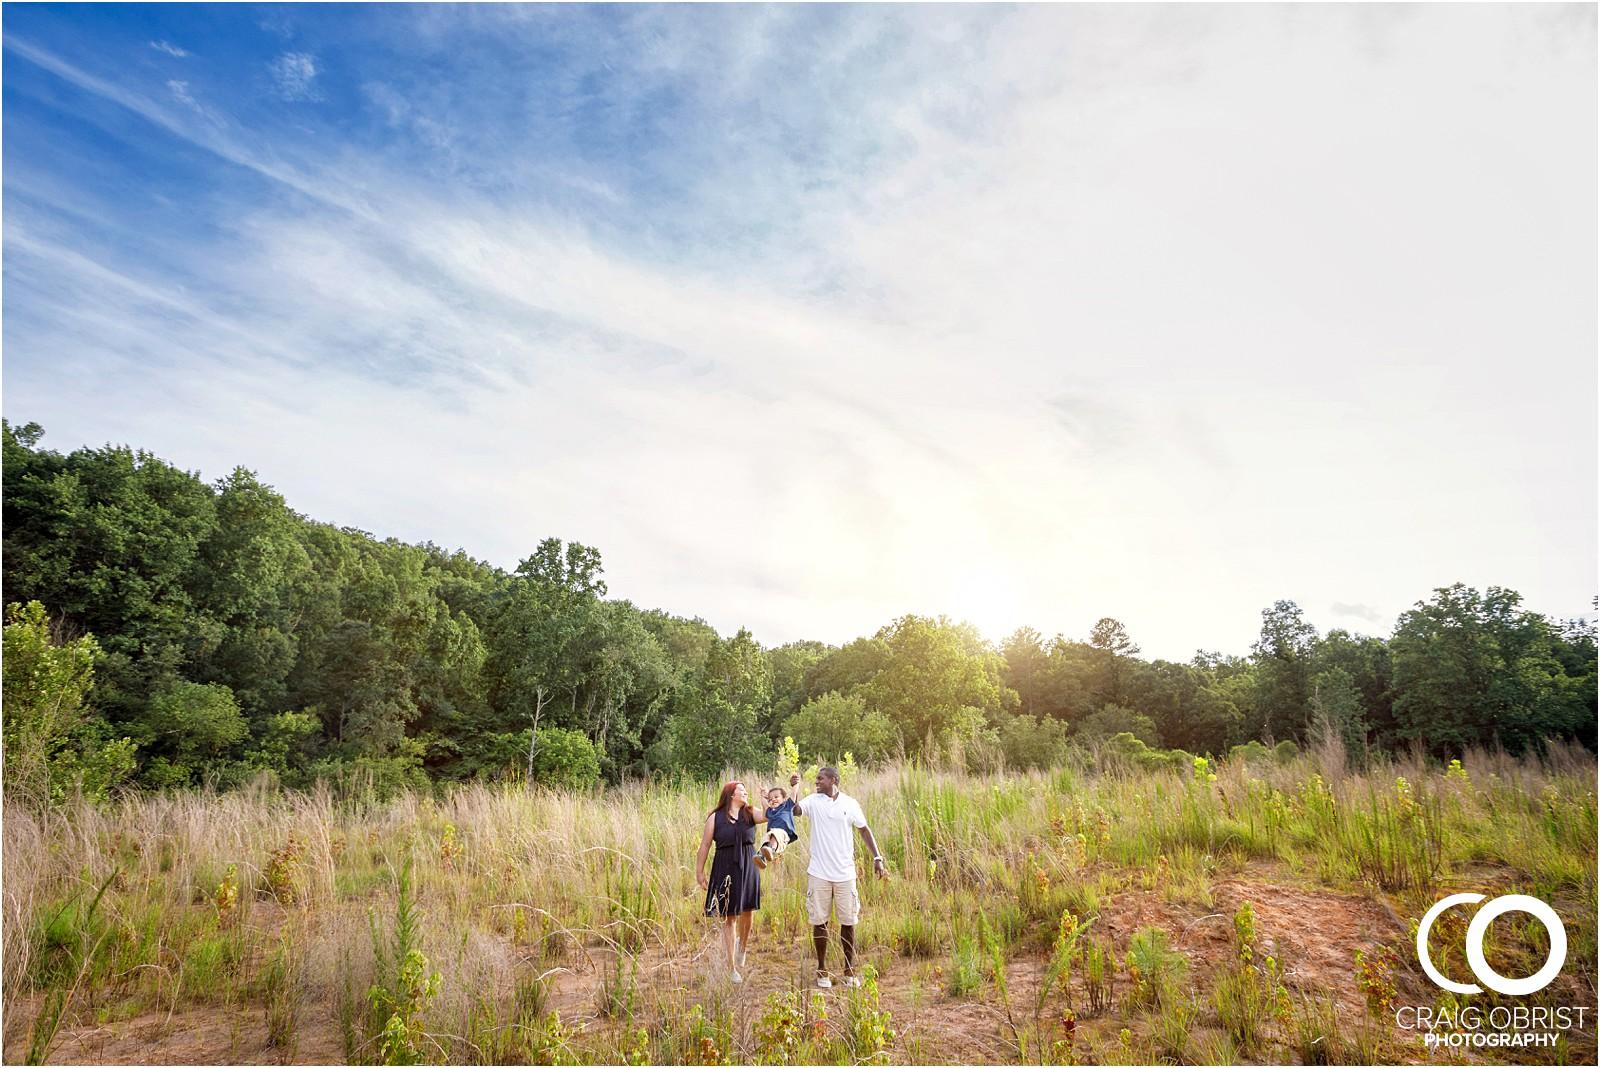 Grass Field Family Portratis Sunset Atlanta_0032.jpg